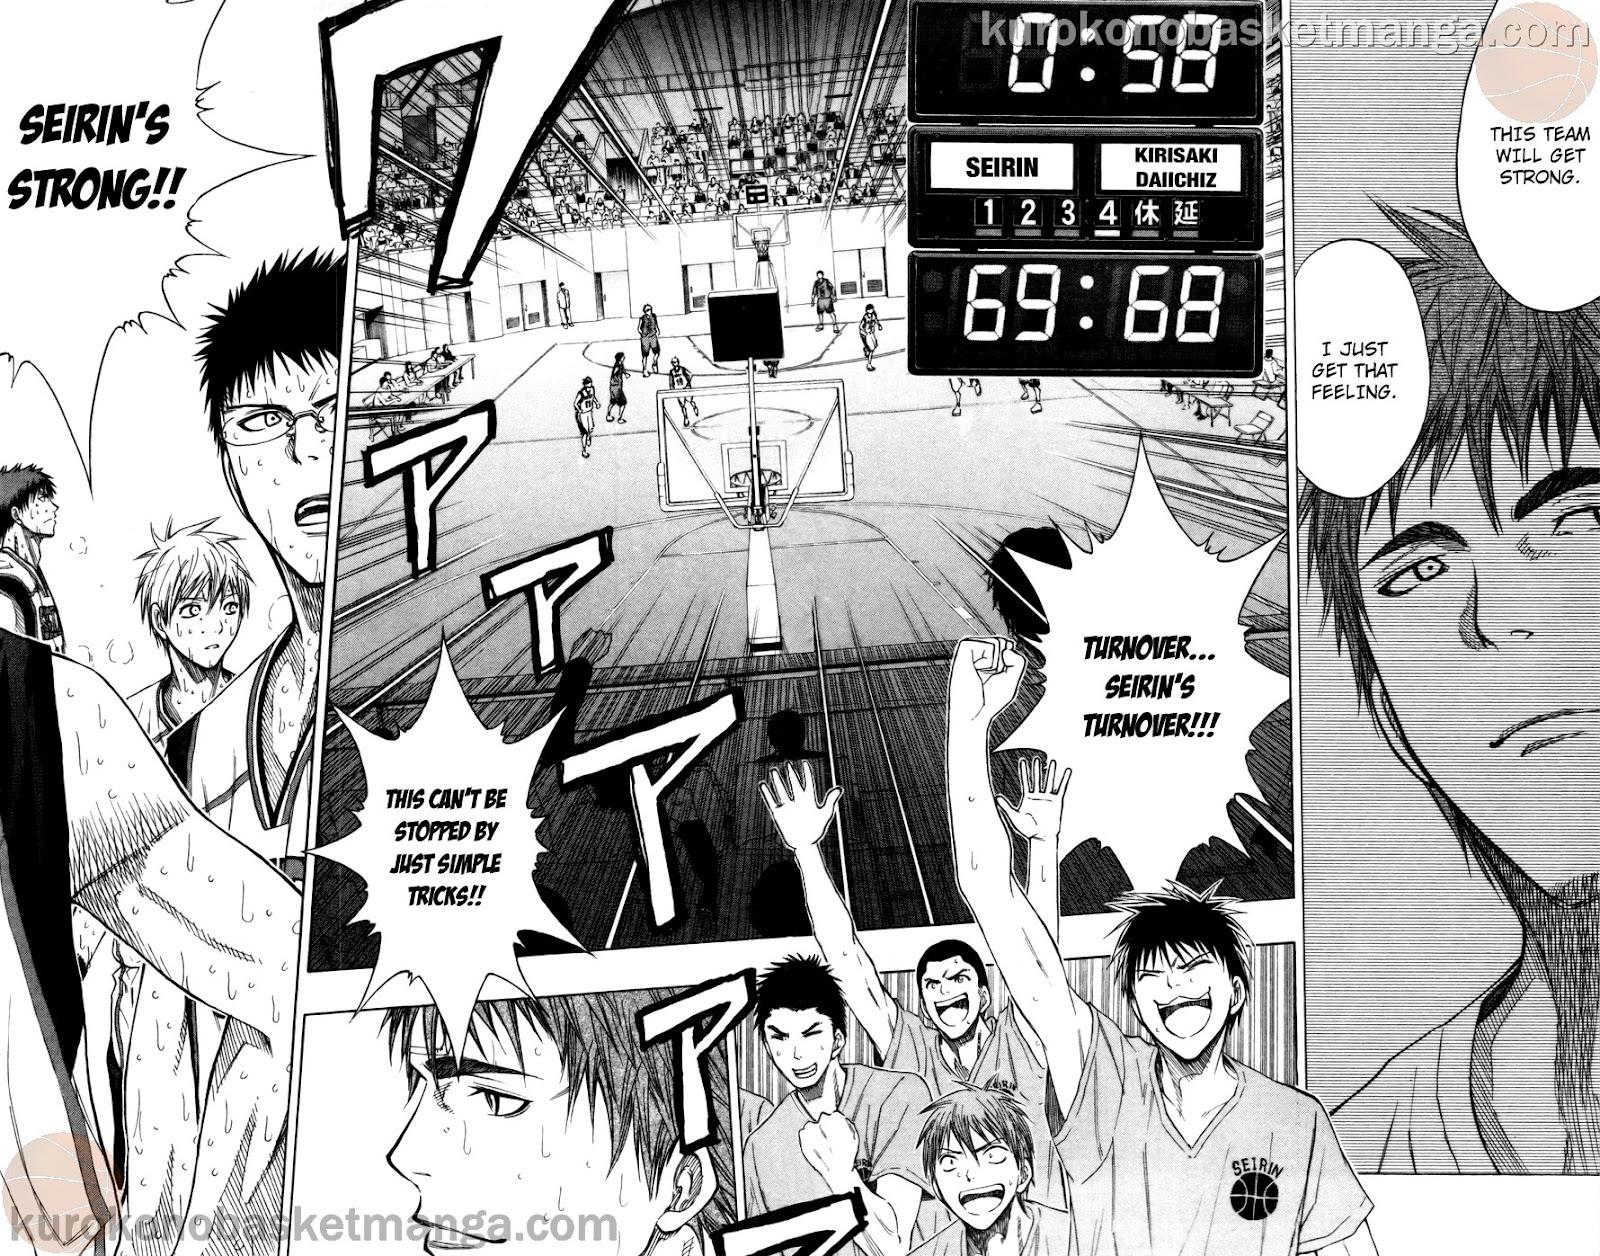 Kuroko no Basket Manga Chapter 106 - Image 18-19